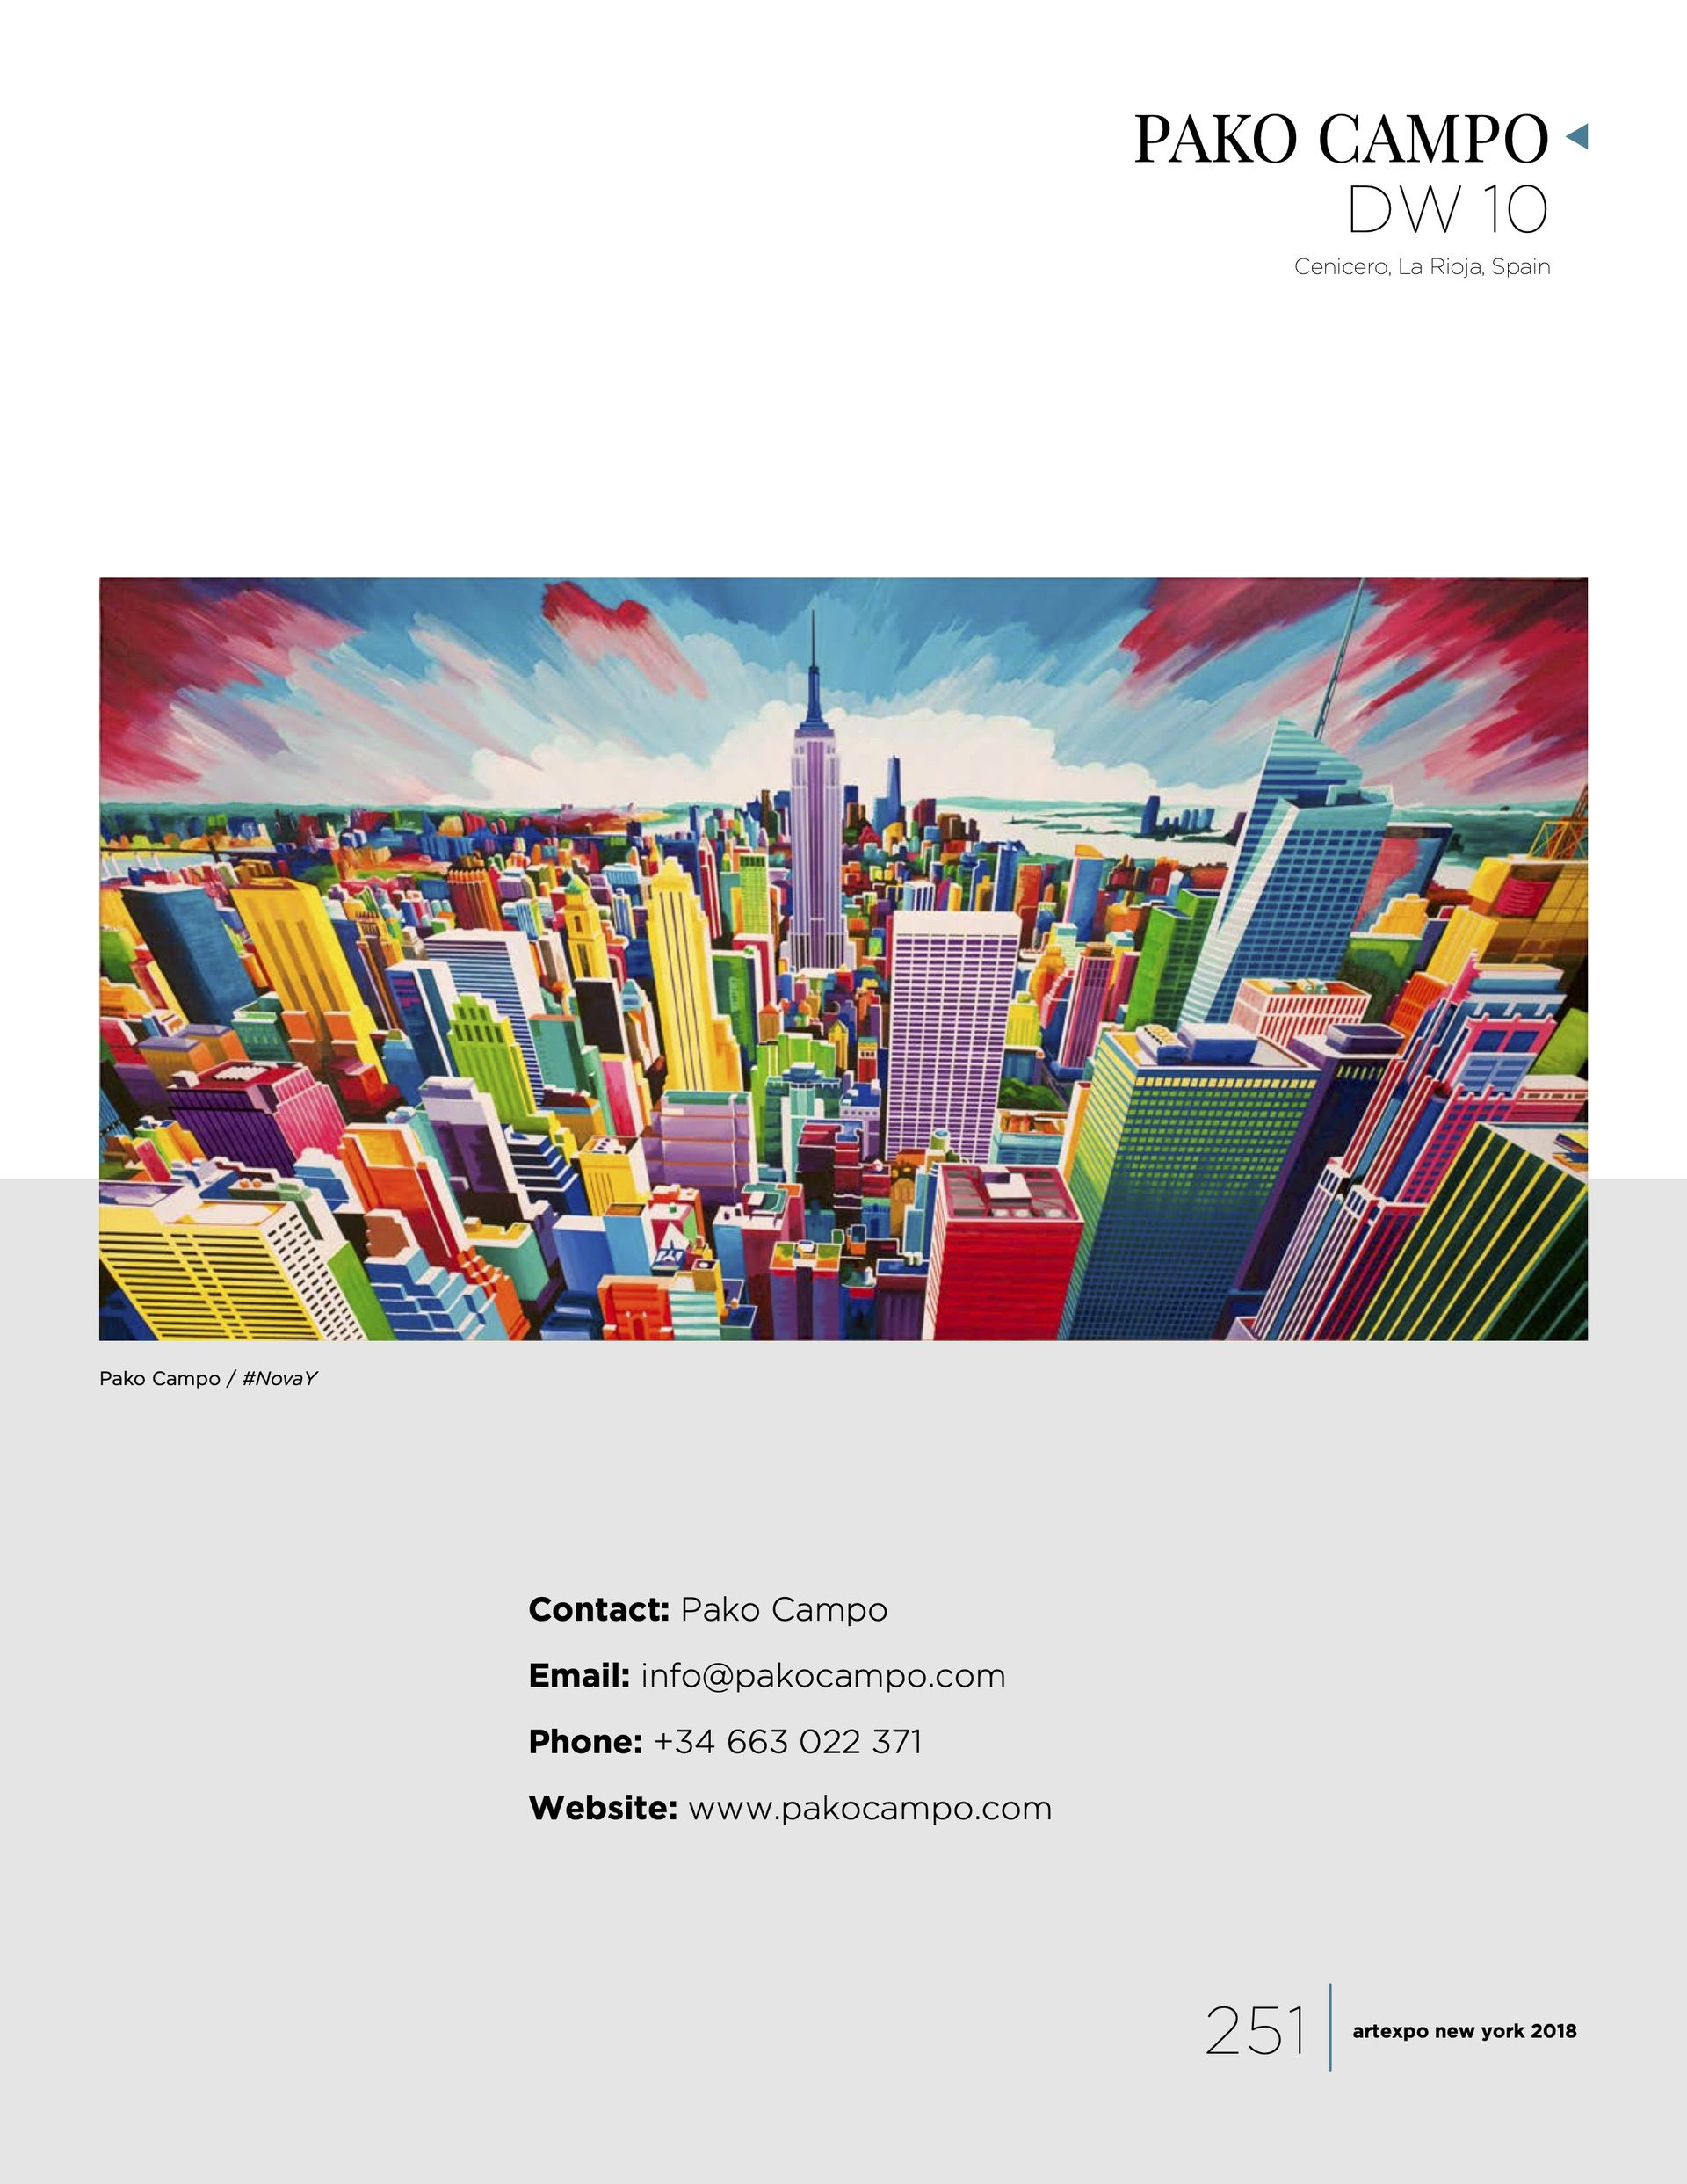 Artexpo New York. 2018 Show Catalog